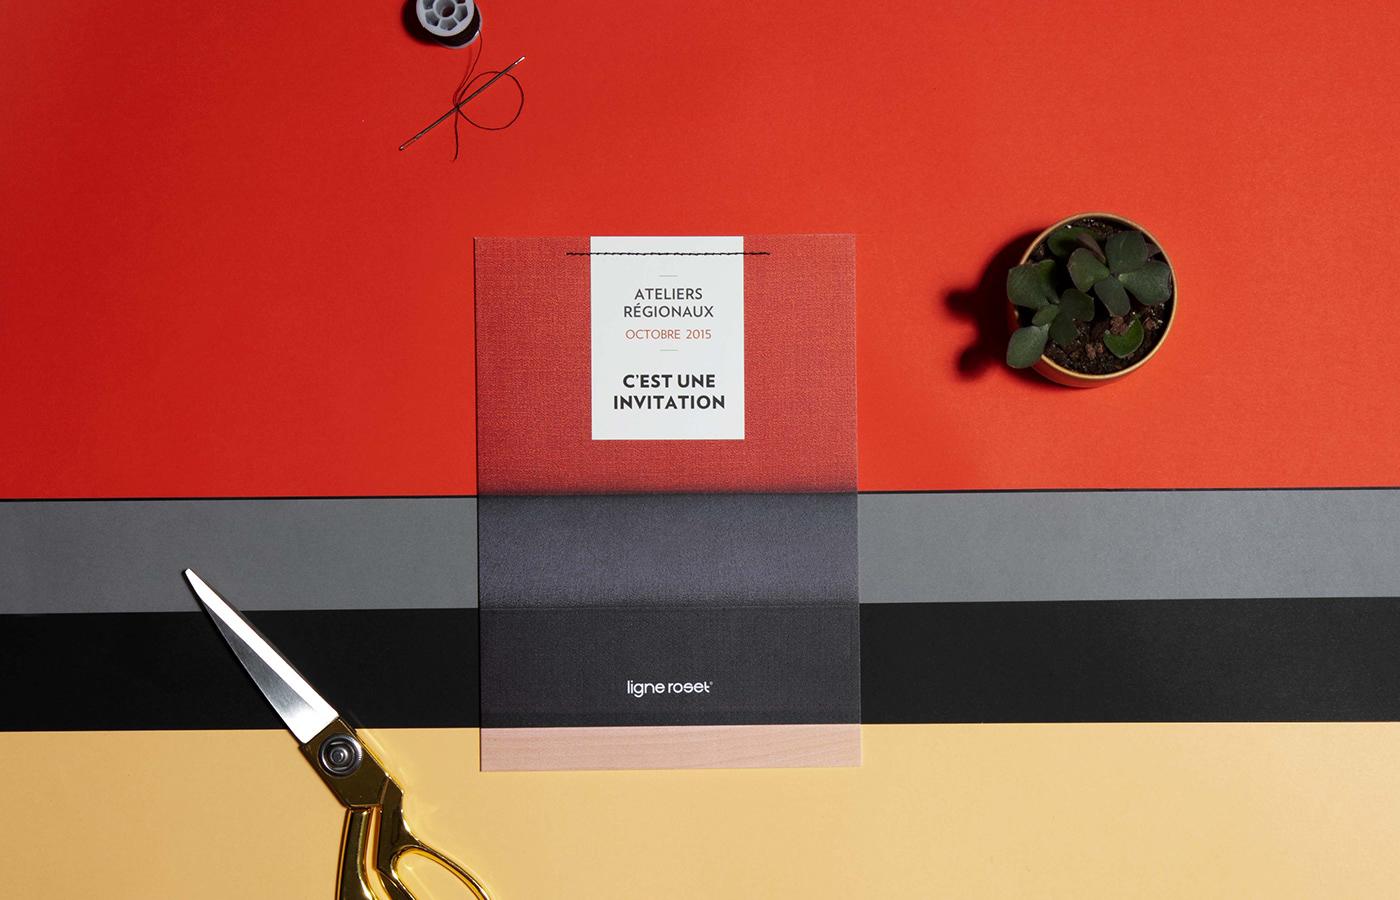 a4 a5 coated paper couture graphic design  Invitation papier print print design